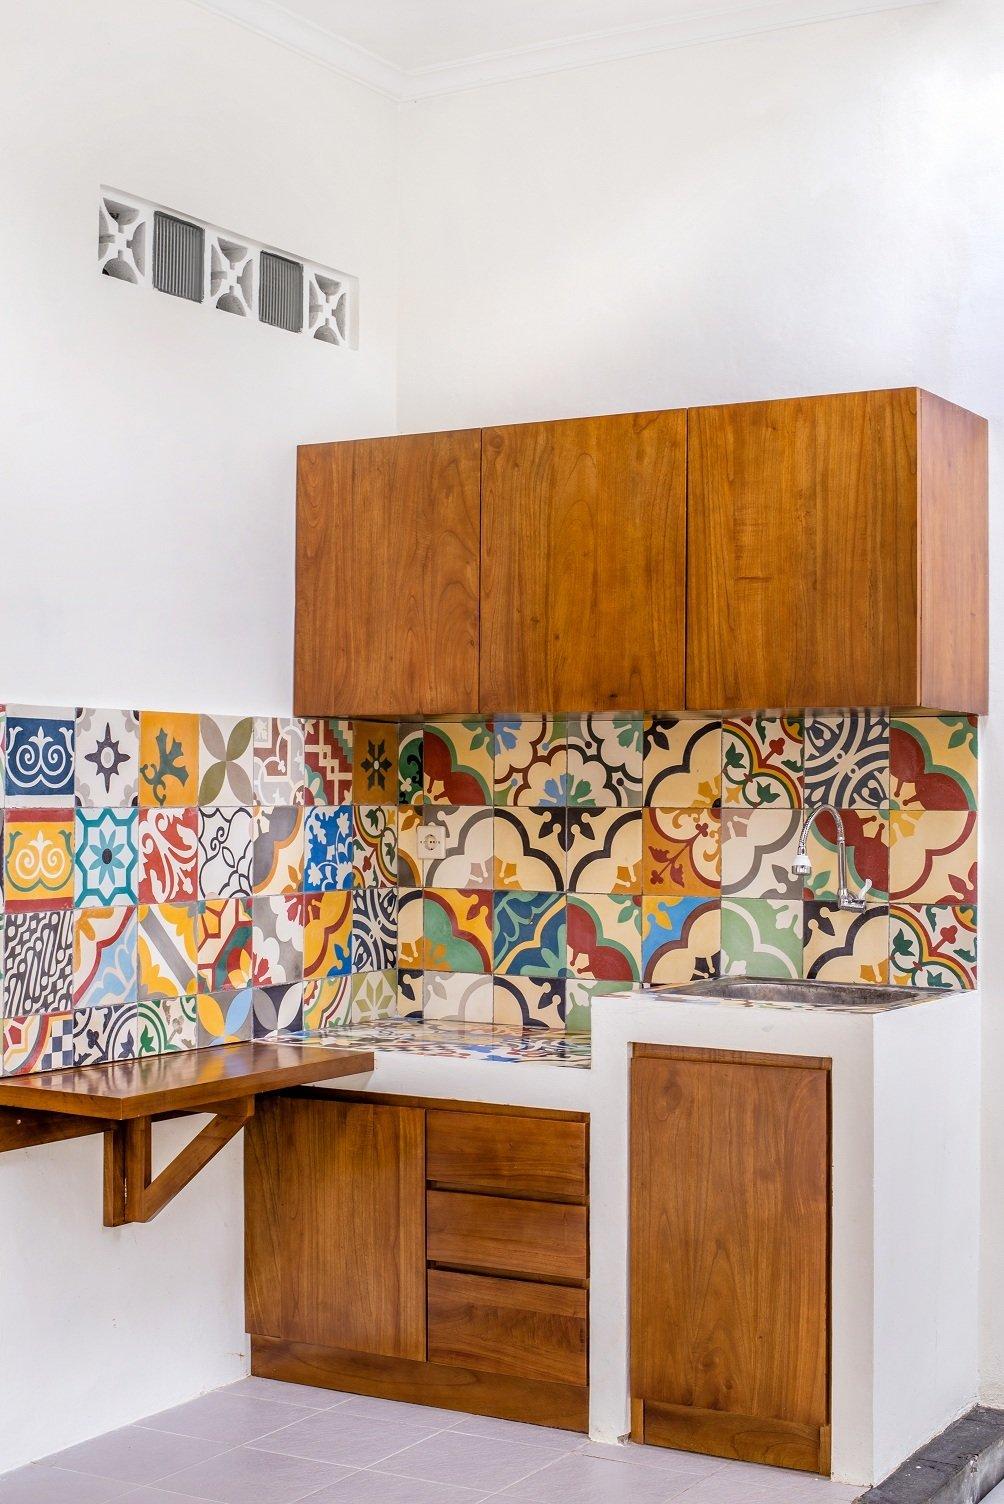 Kitchen, Tile, Wood, Ceramic Tile, Ceramic Tile, Concrete, Dishwasher, Ceiling, Range Hood, and Drop In  Best Kitchen Tile Wood Photos from Prawirotaman Street